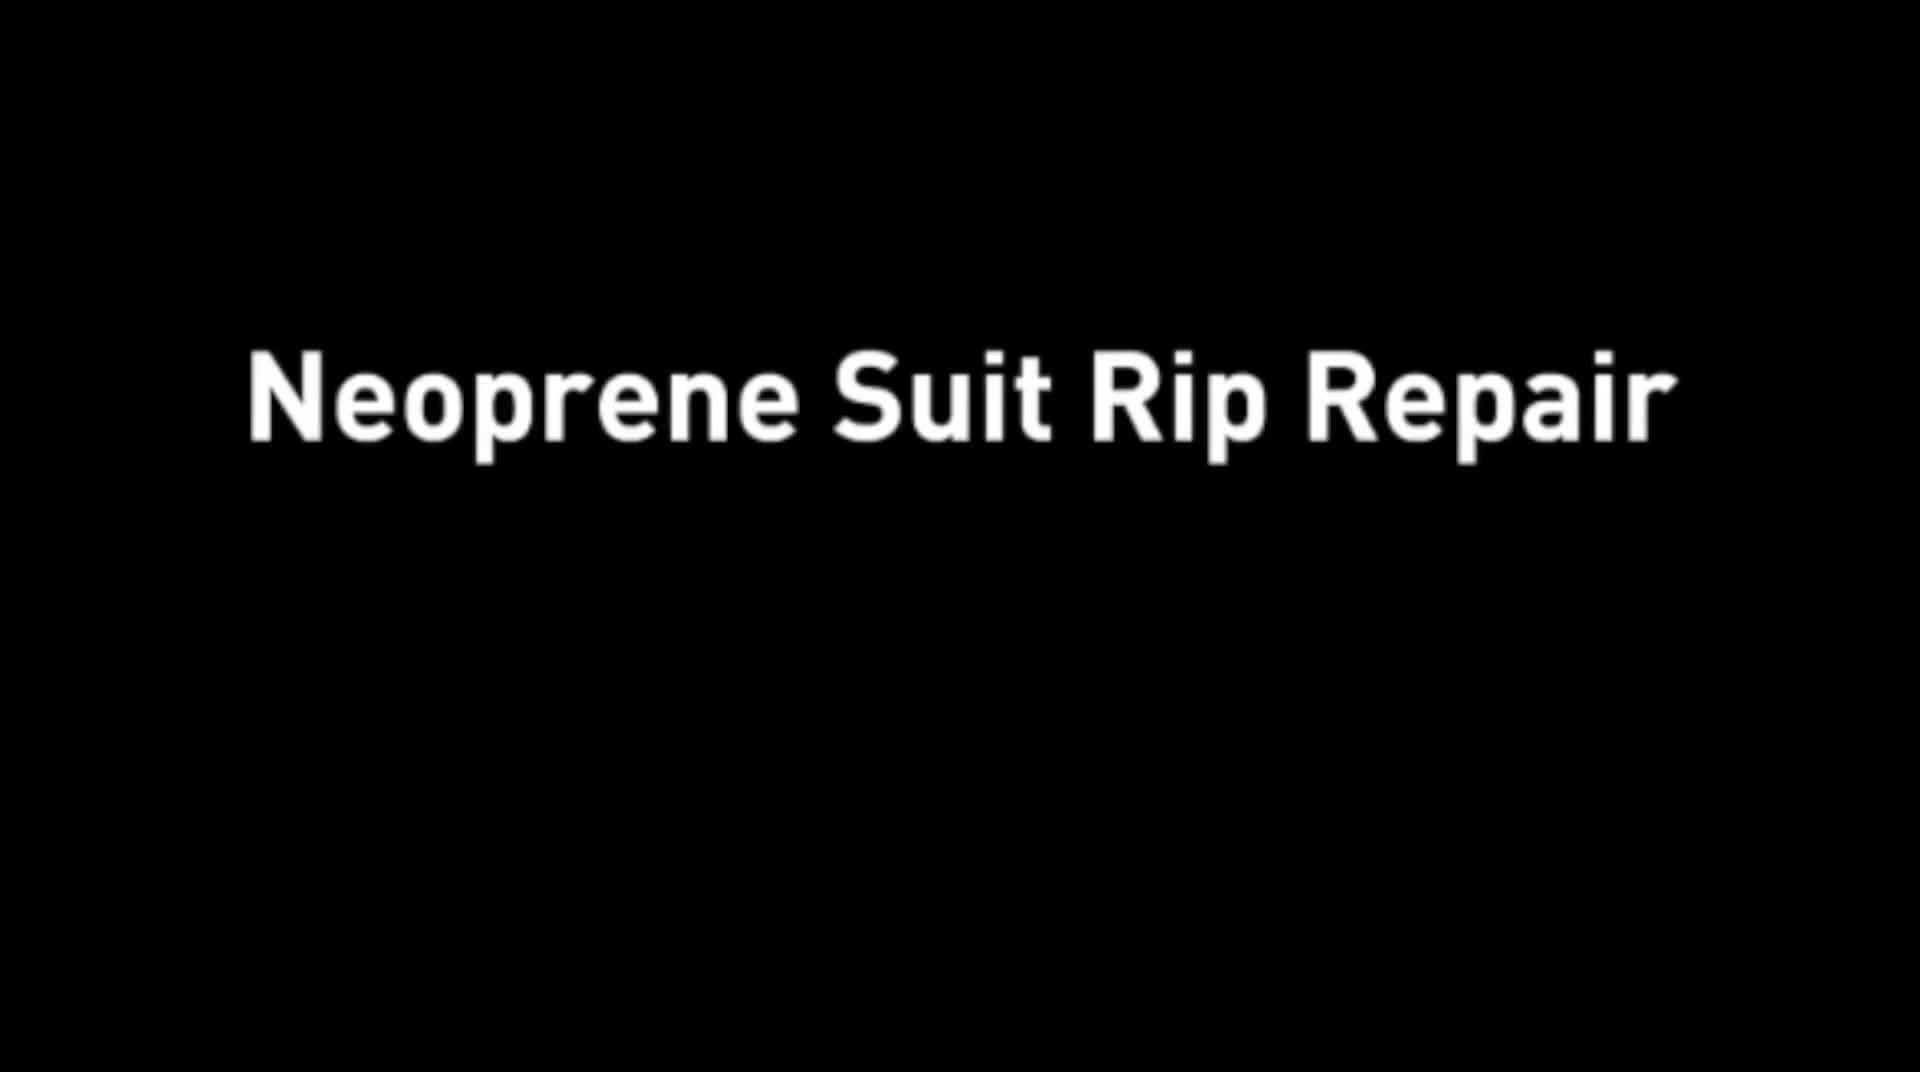 Heavy duty neoprene sealant diving suit repair kit